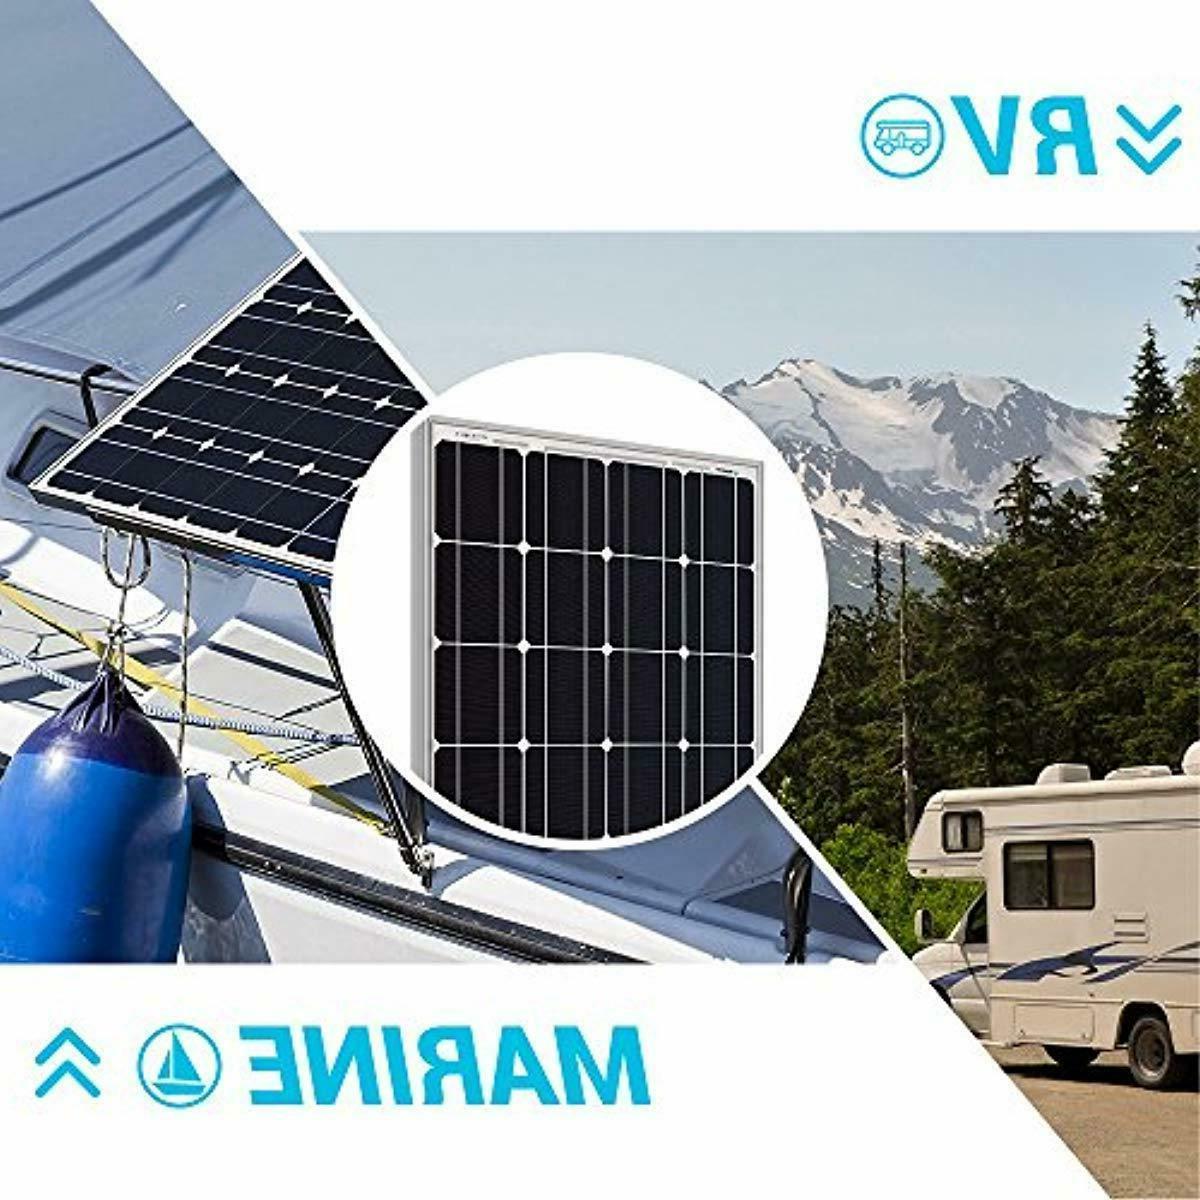 Renogy 100 Watts 12 Volts Monocrystalline Solar